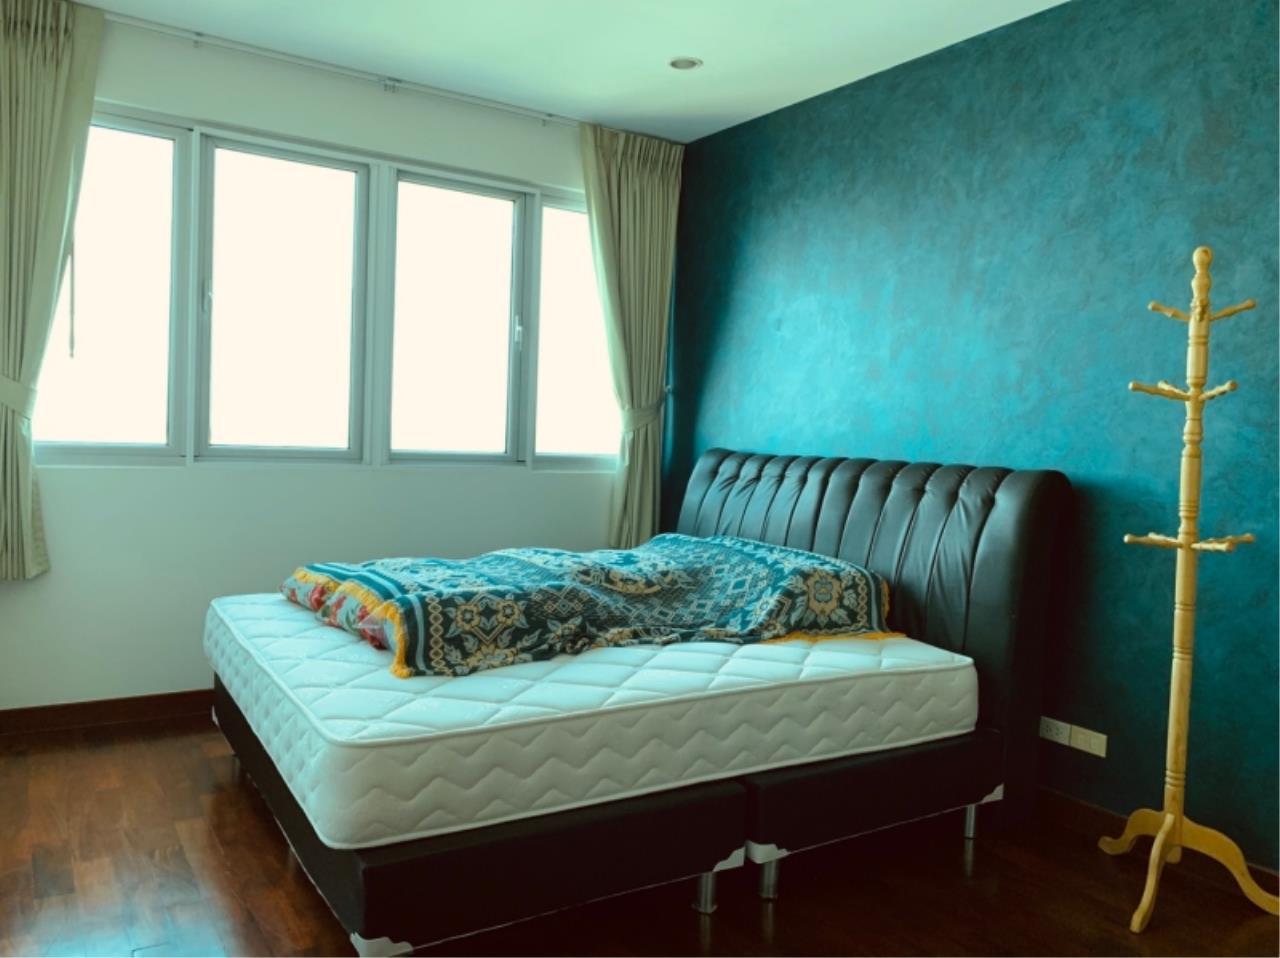 Century21 Skylux Agency's The Star Estate @ Narathiwas / Condo For Rent / 3 Bedroom / 165.09 SQM / BTS Chong Nonsi / Bangkok 2